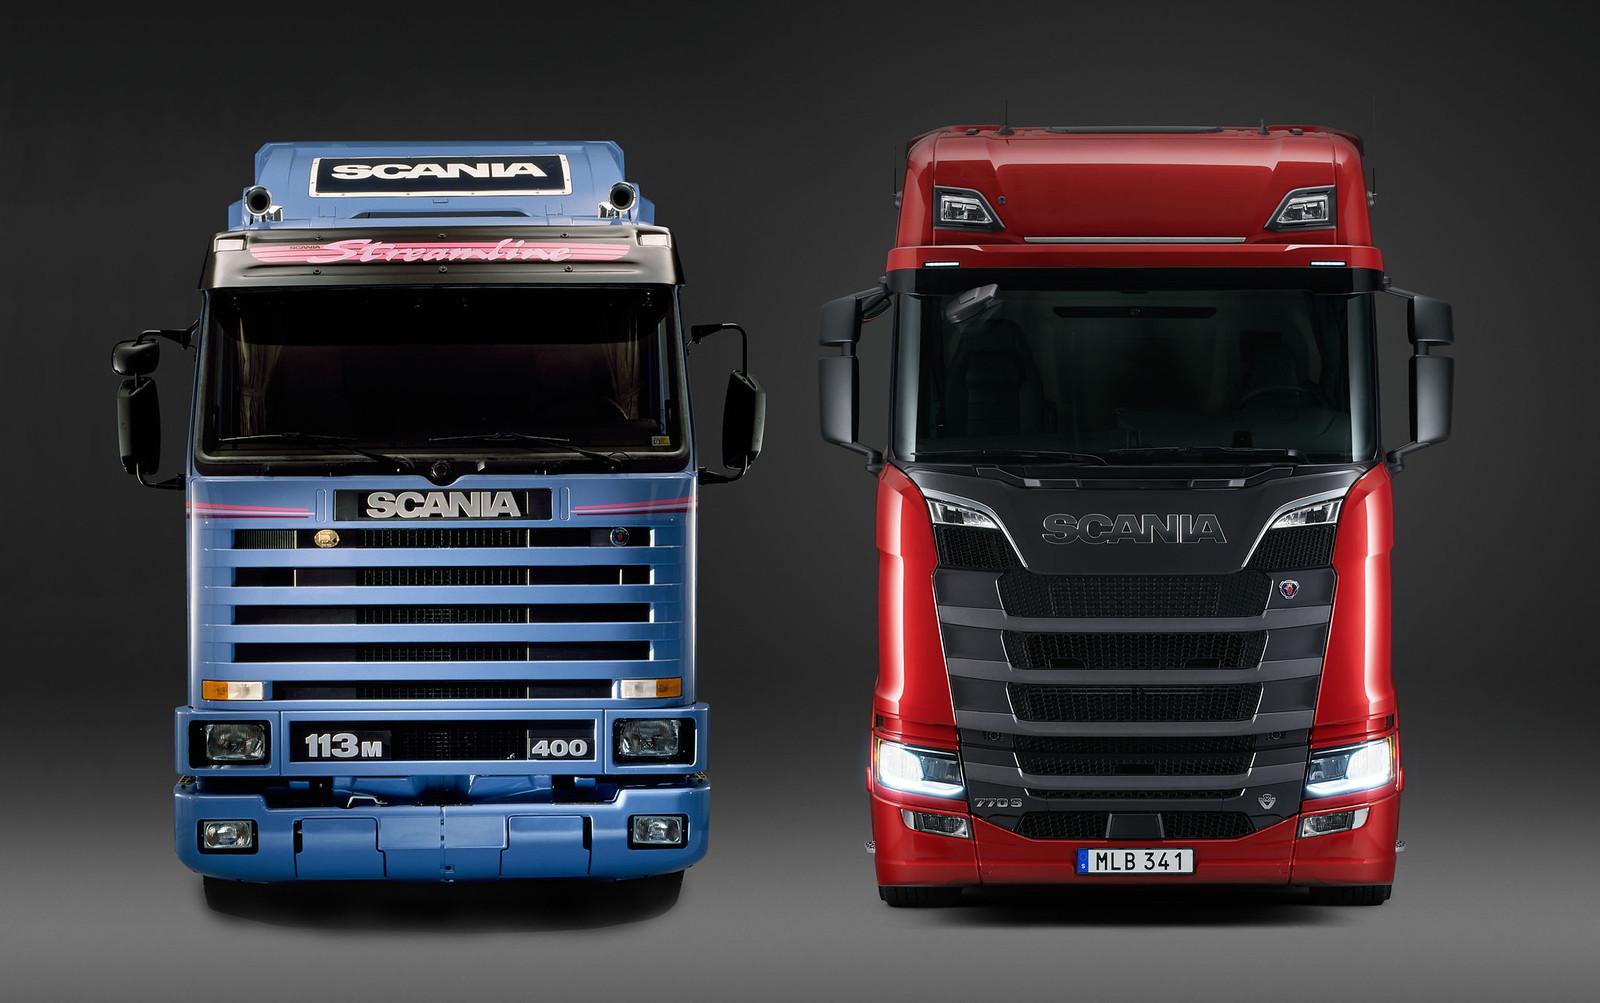 #Keltruck's classic #Scania trucks